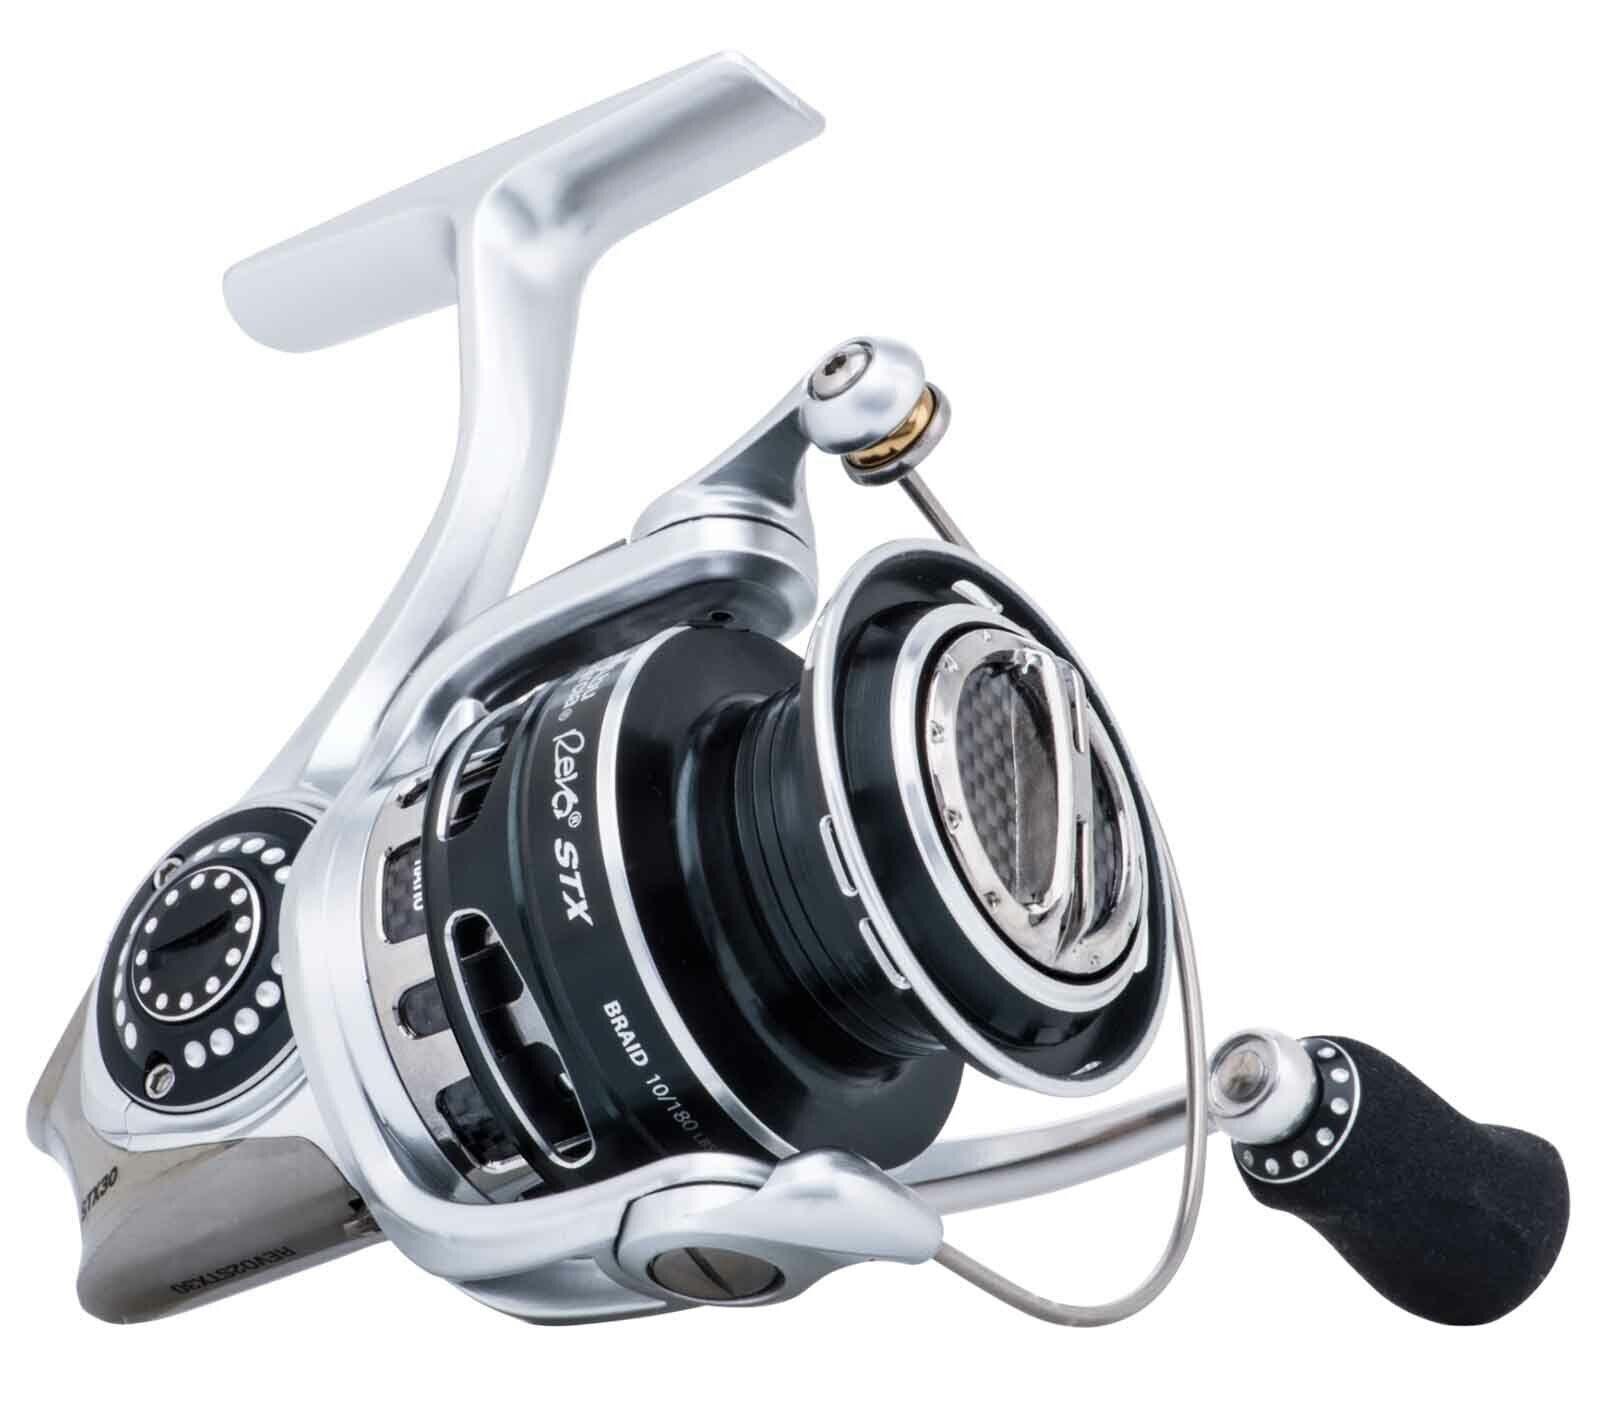 Abu Garcia Revo STX Spinning Fixed Spool Spin FD Fishing Reel - All Models